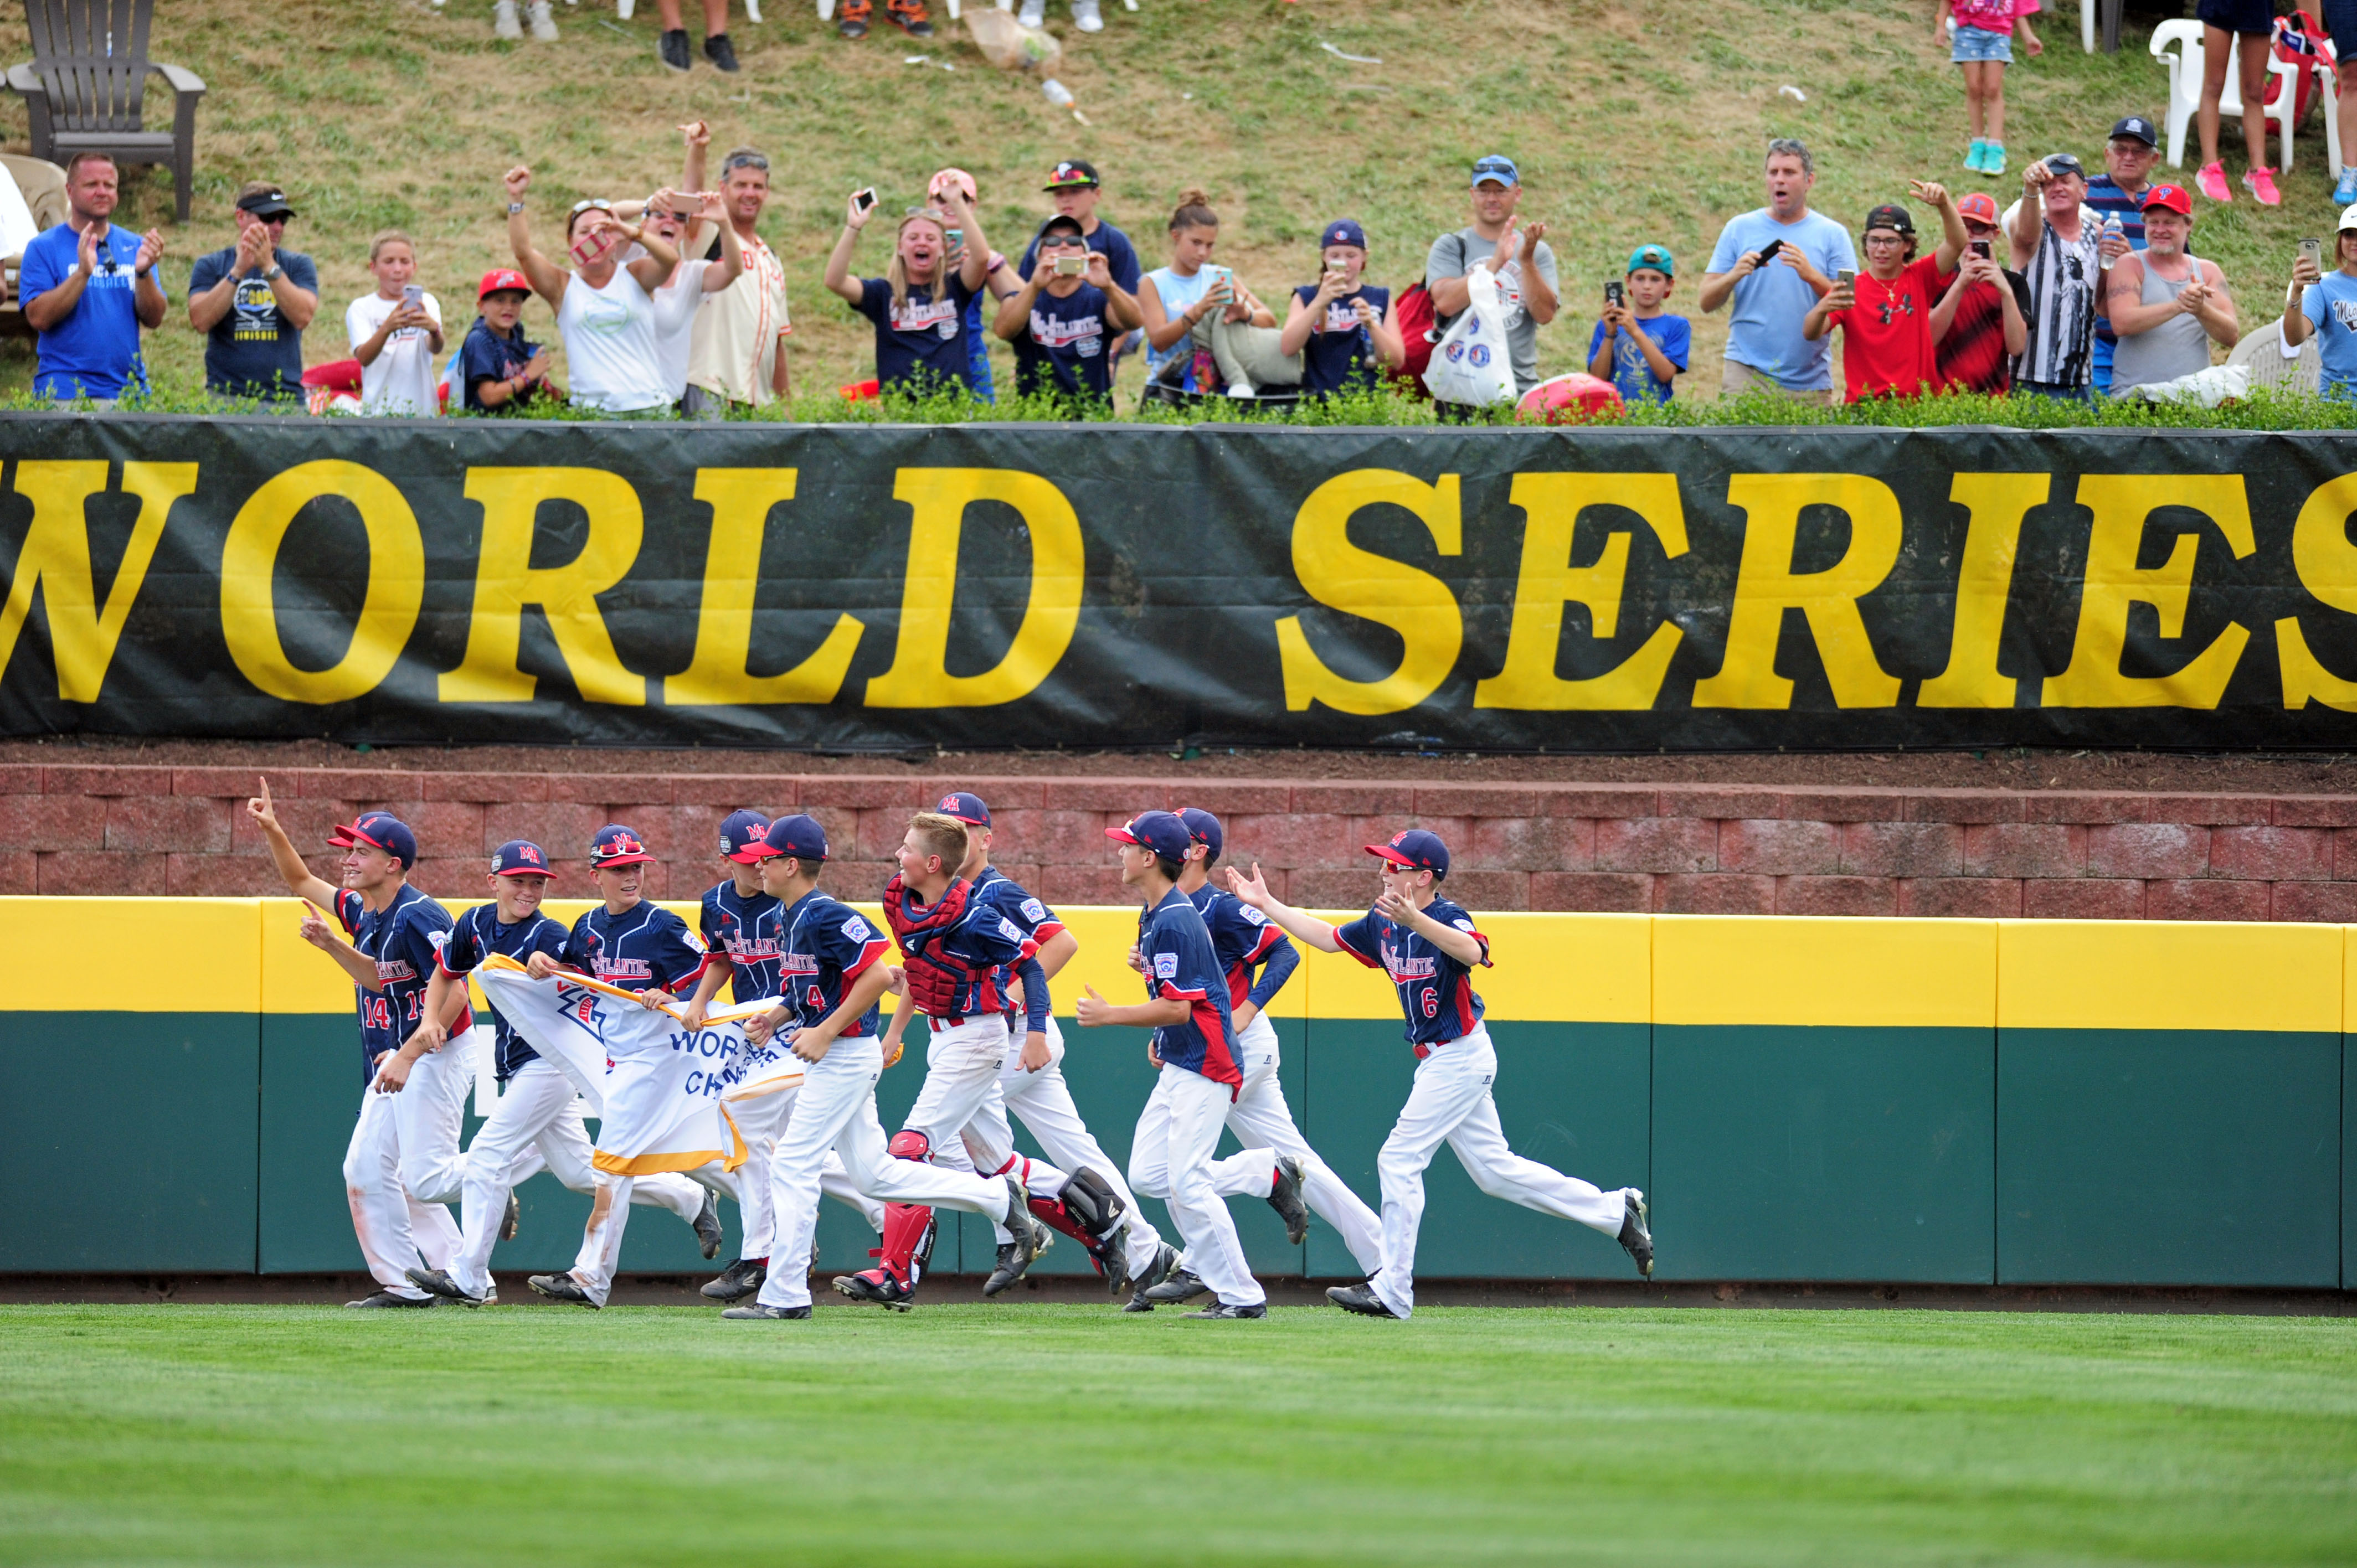 Baseball: Little League World Series-Asia-Pacific Region vs Mid-Atlantic Region